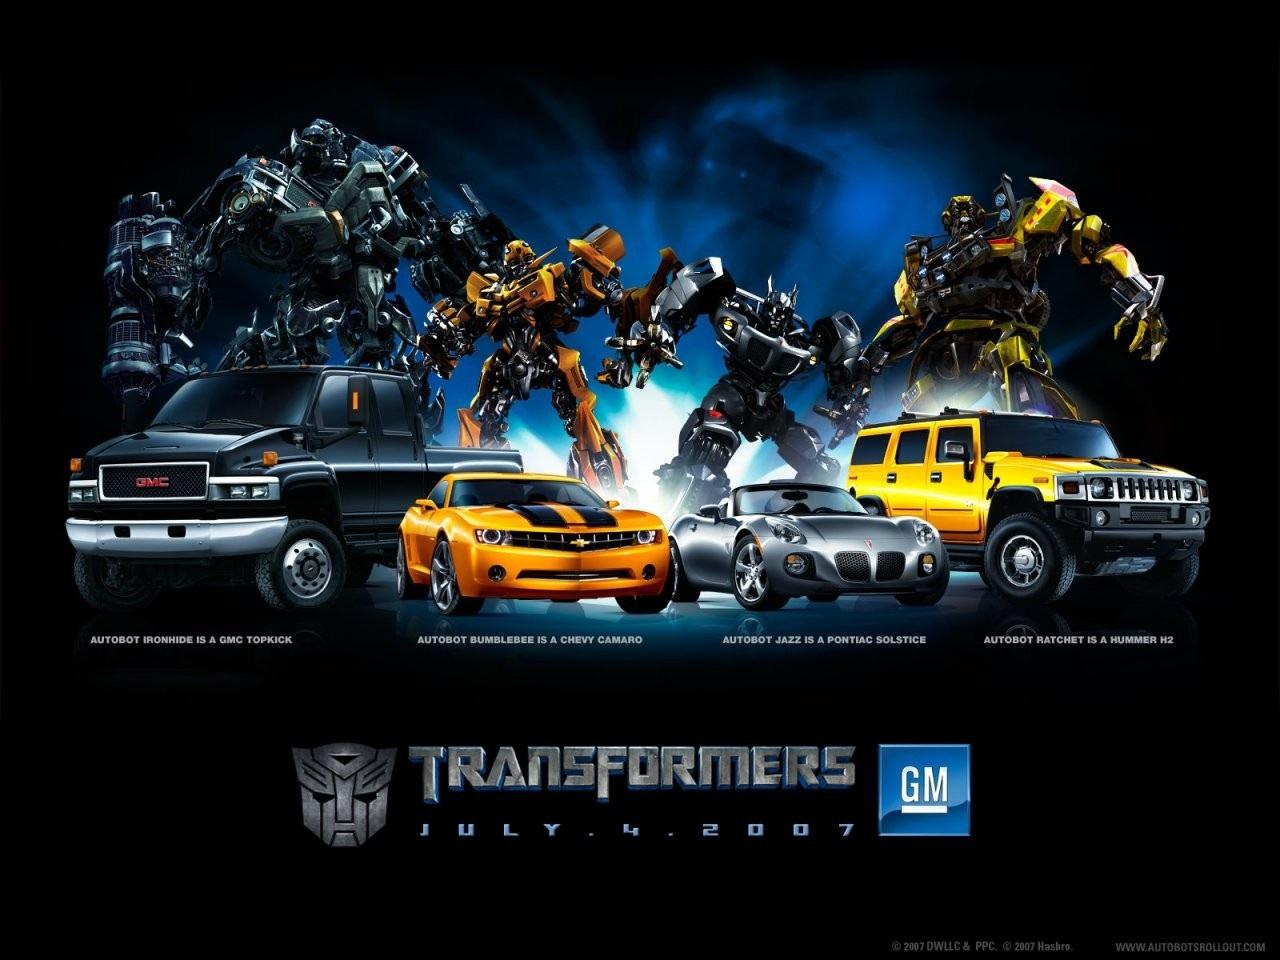 http://3.bp.blogspot.com/-YLdEzmzYFaM/TrcJWceBW9I/AAAAAAAAAJ4/-T6PYPT7-m8/s1600/Autobots-Wallpaper-transformers-24079233-1280-960.jpg